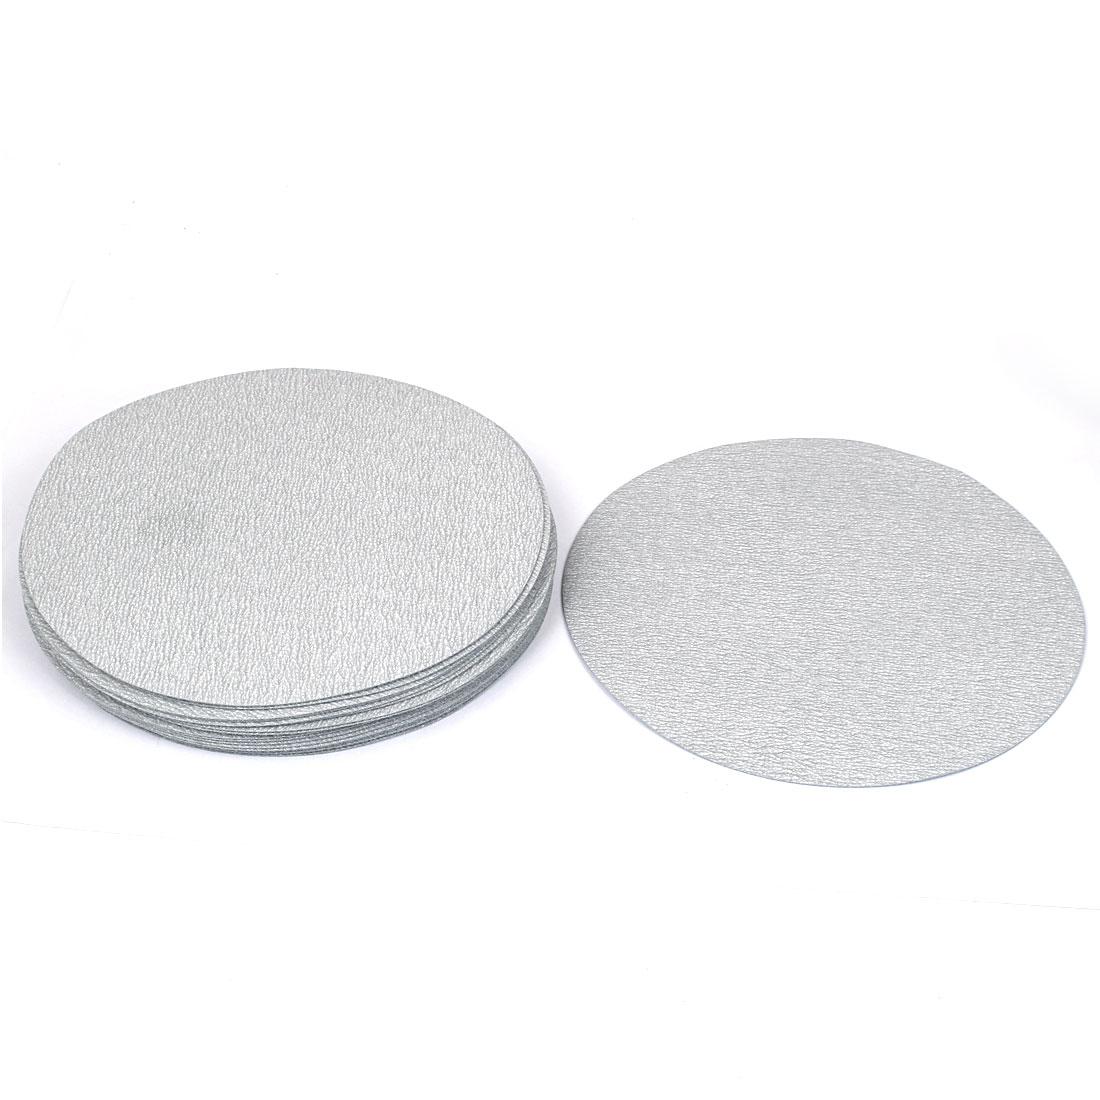 "7"" Dia Polishing Round Dry Abrasive Sanding Sandpaper Sheet Disc 600 Grit 20 Pcs"